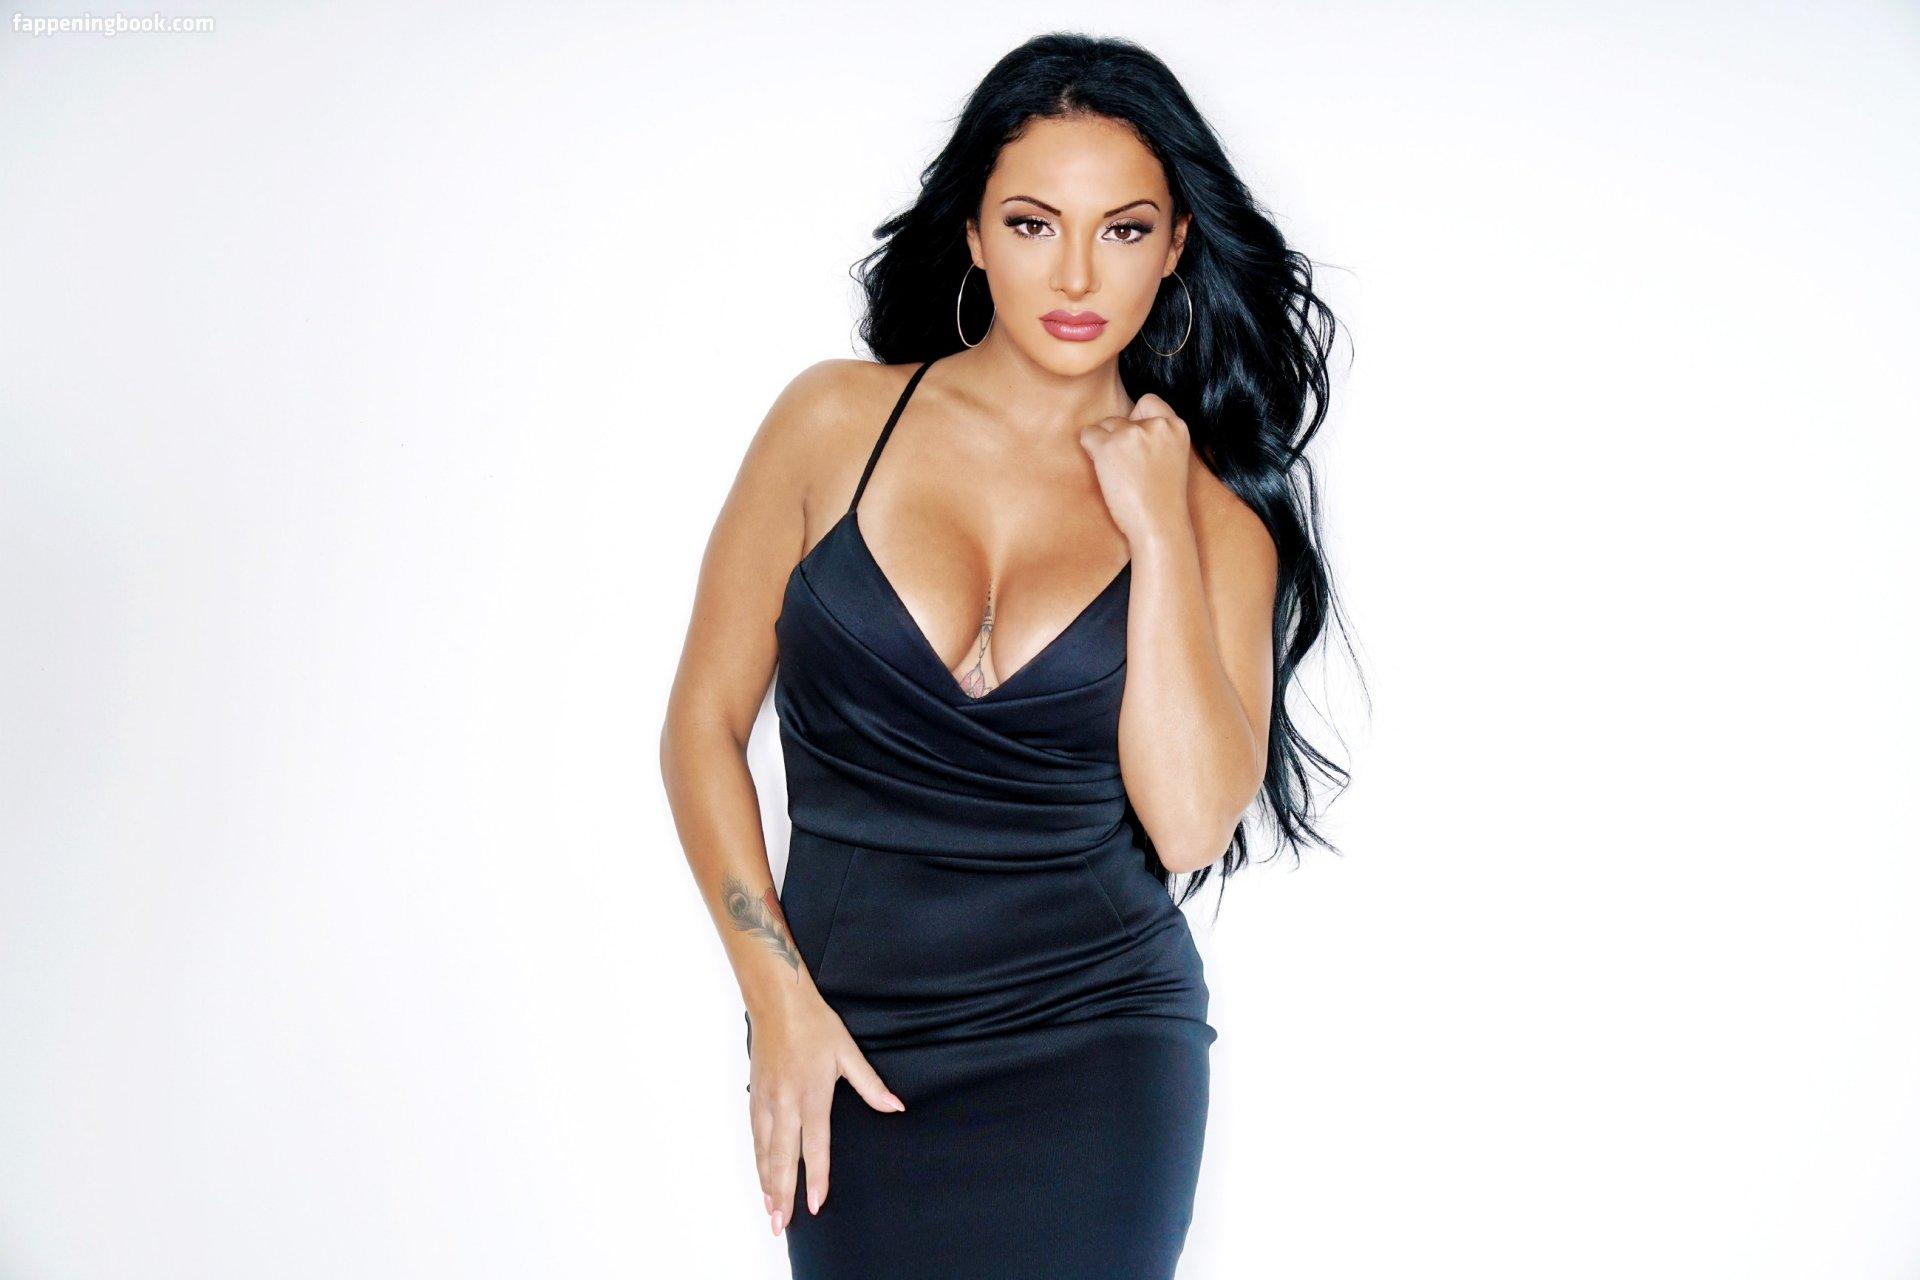 Emilija Mihailova Nude, Sexy, The Fappening, Uncensored